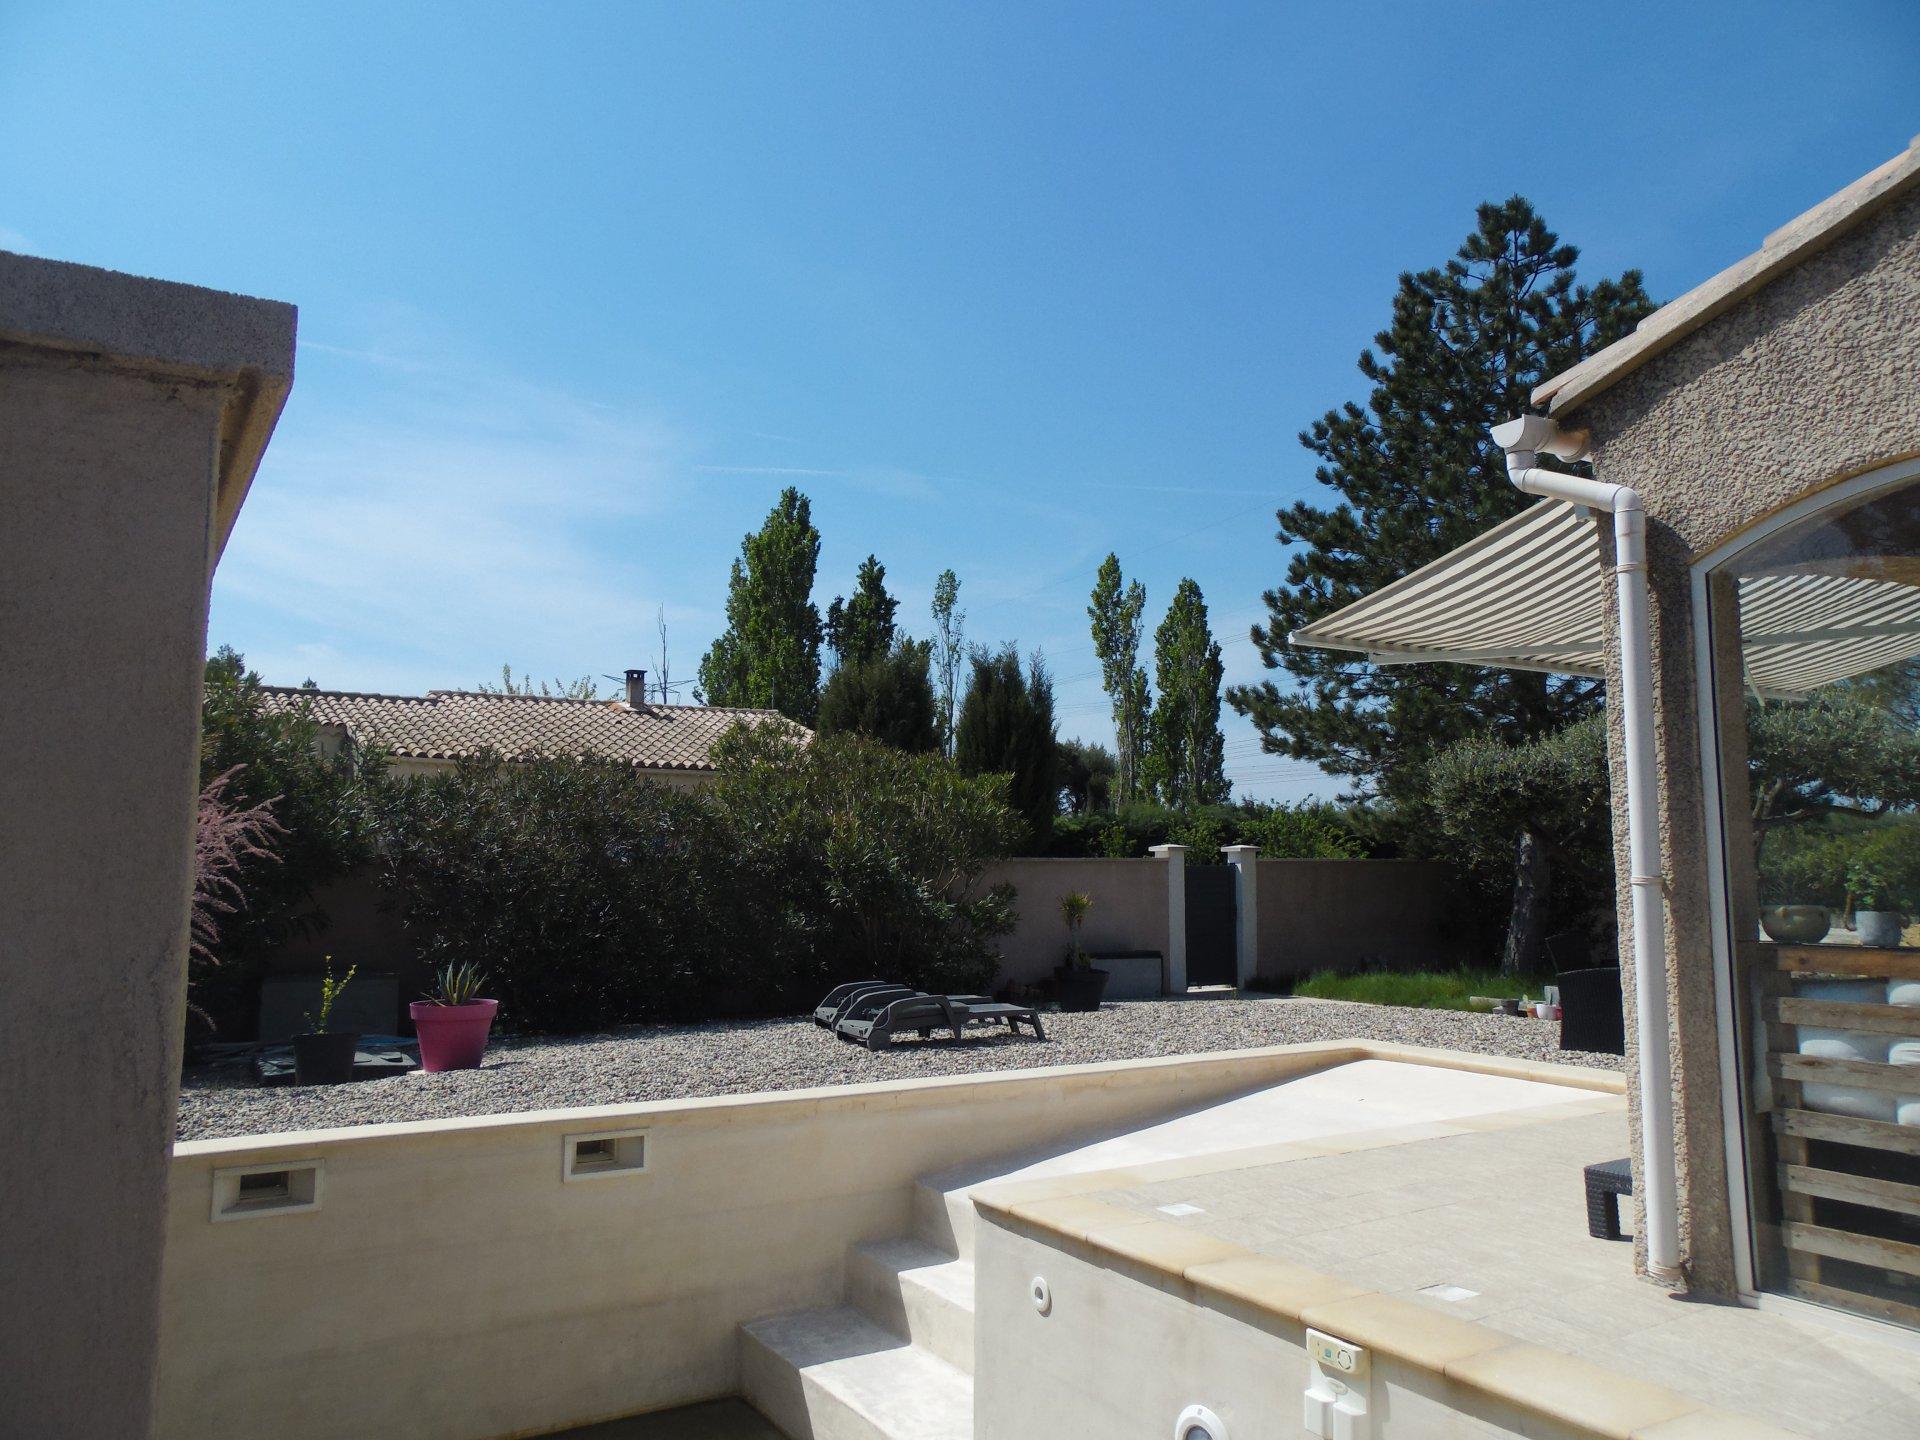 30650 ROCHEFORT DU GARD Villa plain pied avec piscine